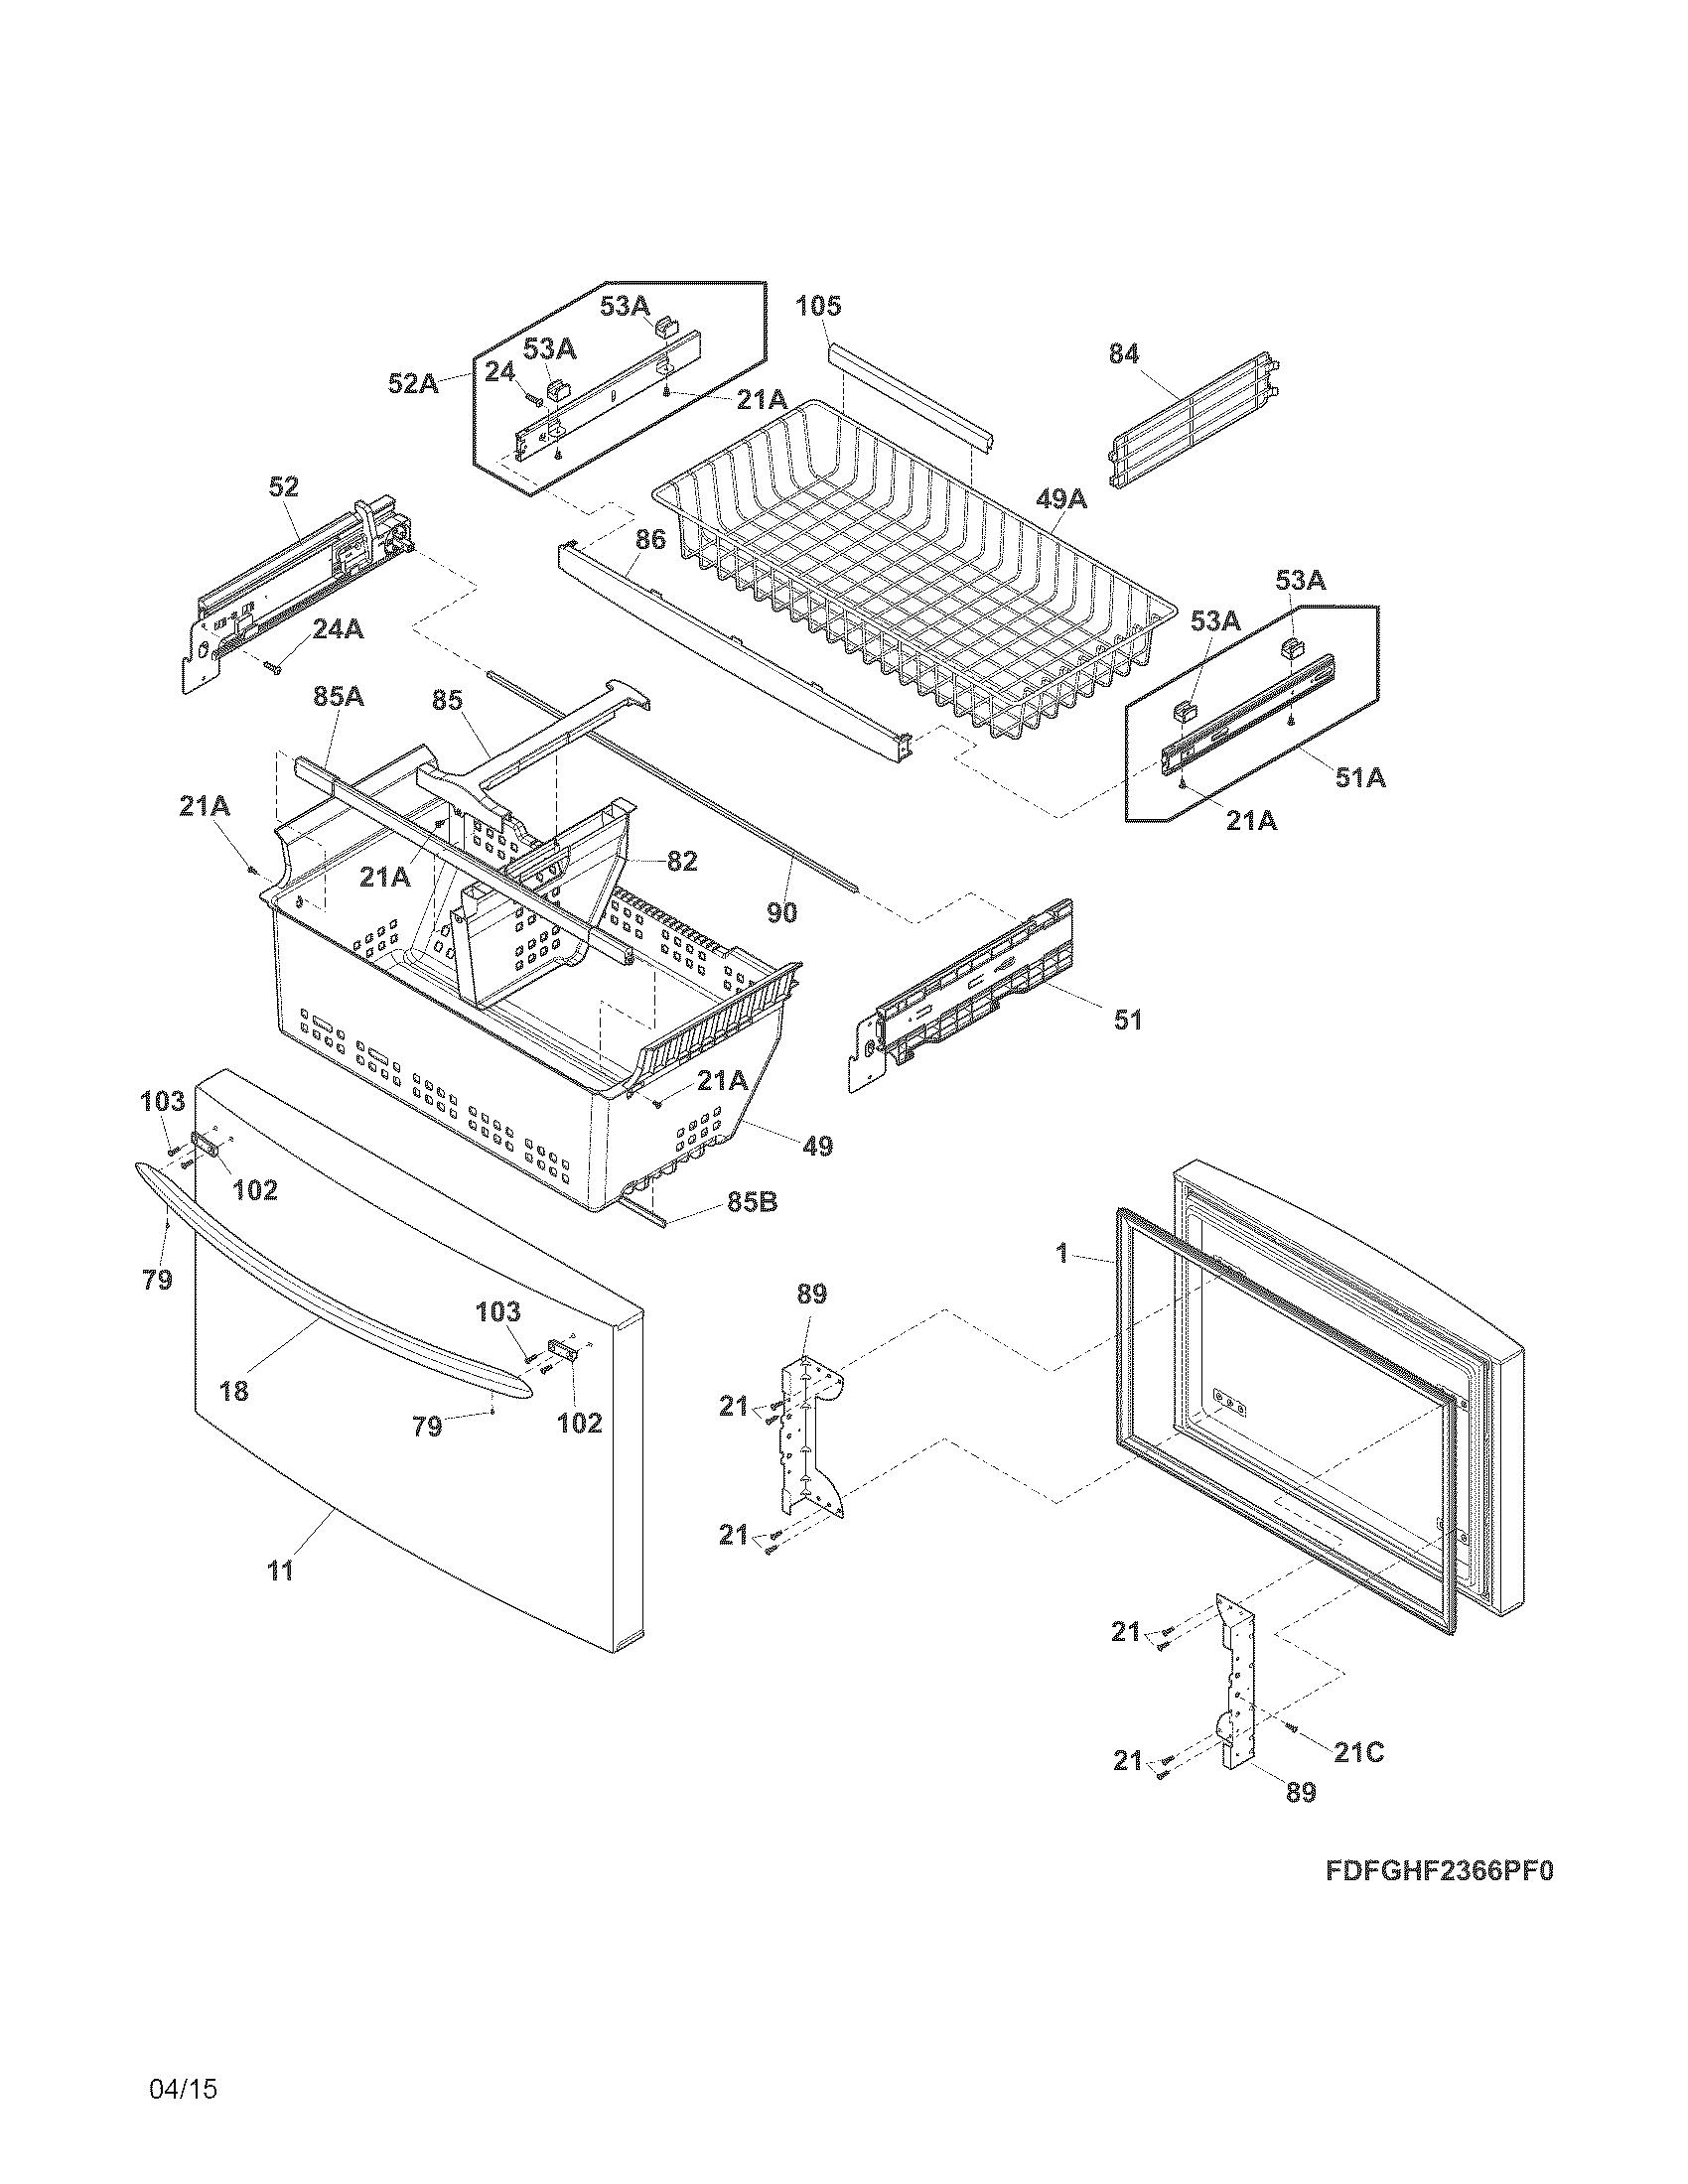 Frigidaire model FGHG2366PF1A bottom-mount refrigerator